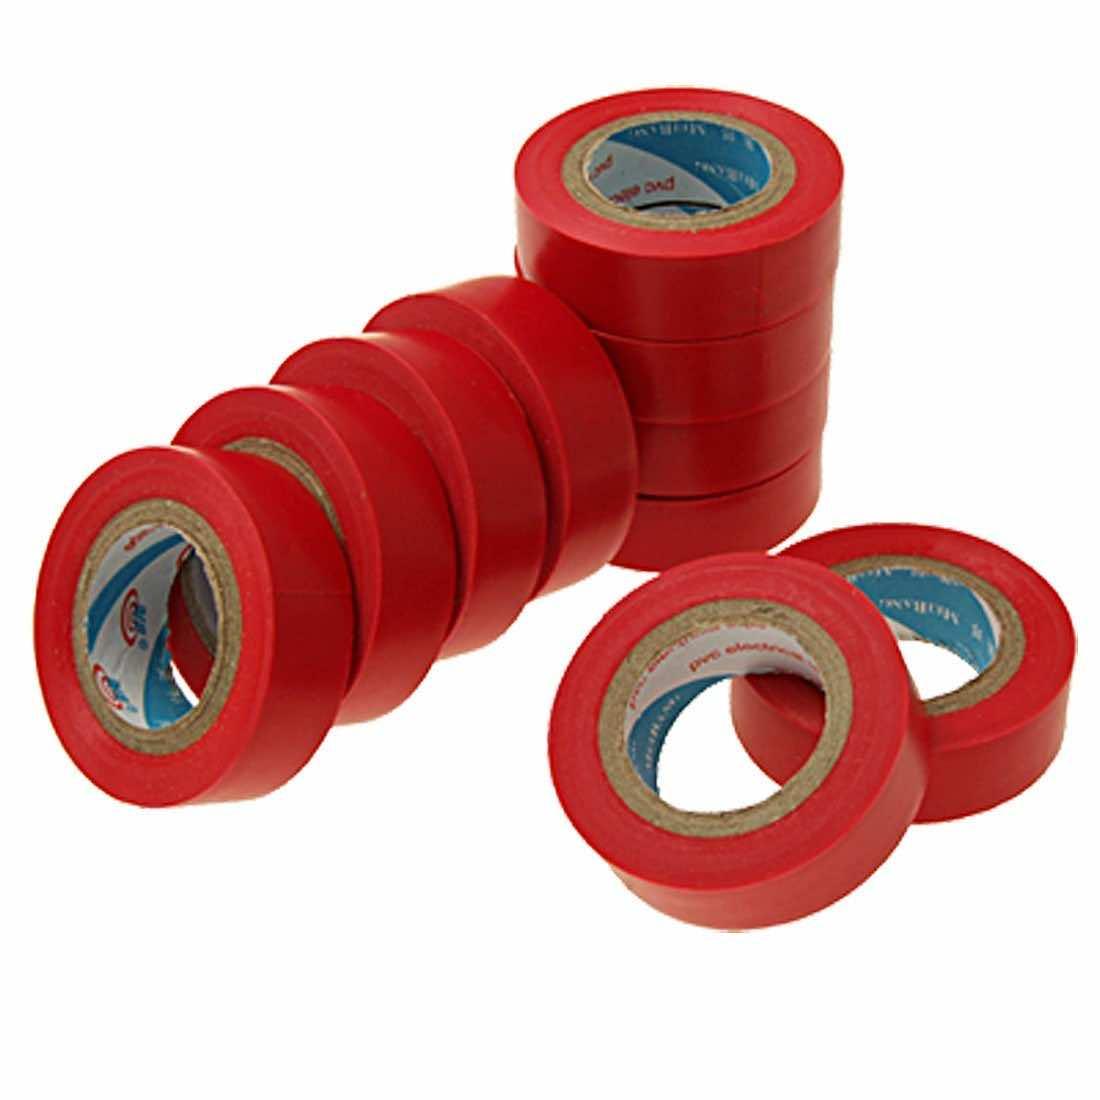 10 Rolls Adhesive PVC Plastic Electrical Tape Black